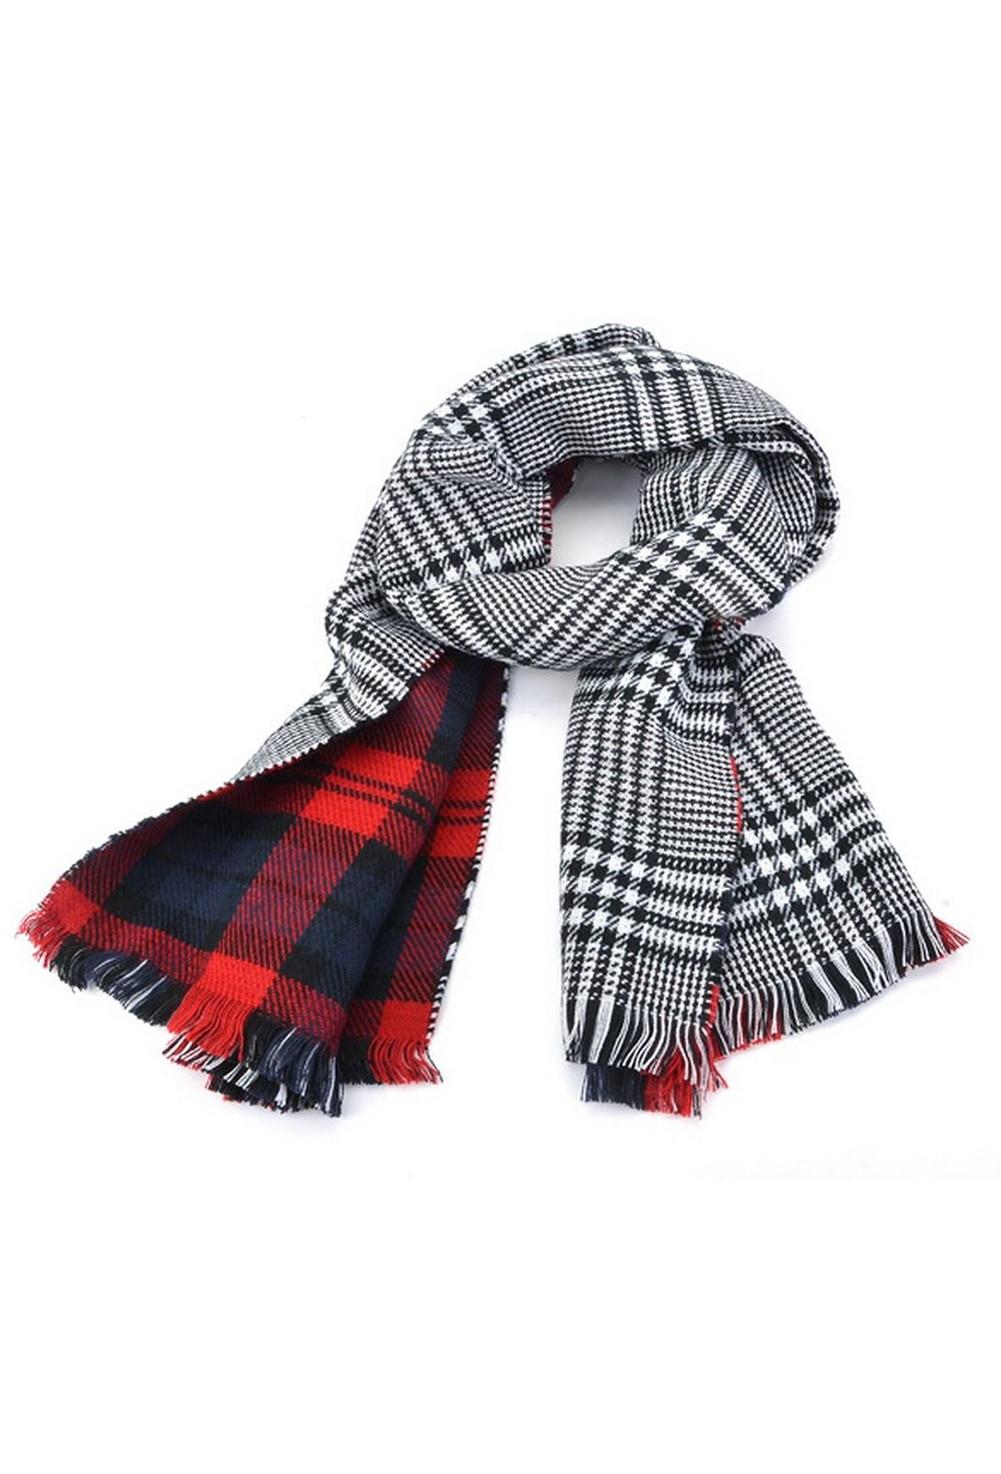 SAF-Lady Women's Long Check Plaid Tartan   Scarf     Wraps   Shawl Stole Warm   Scarves   Red